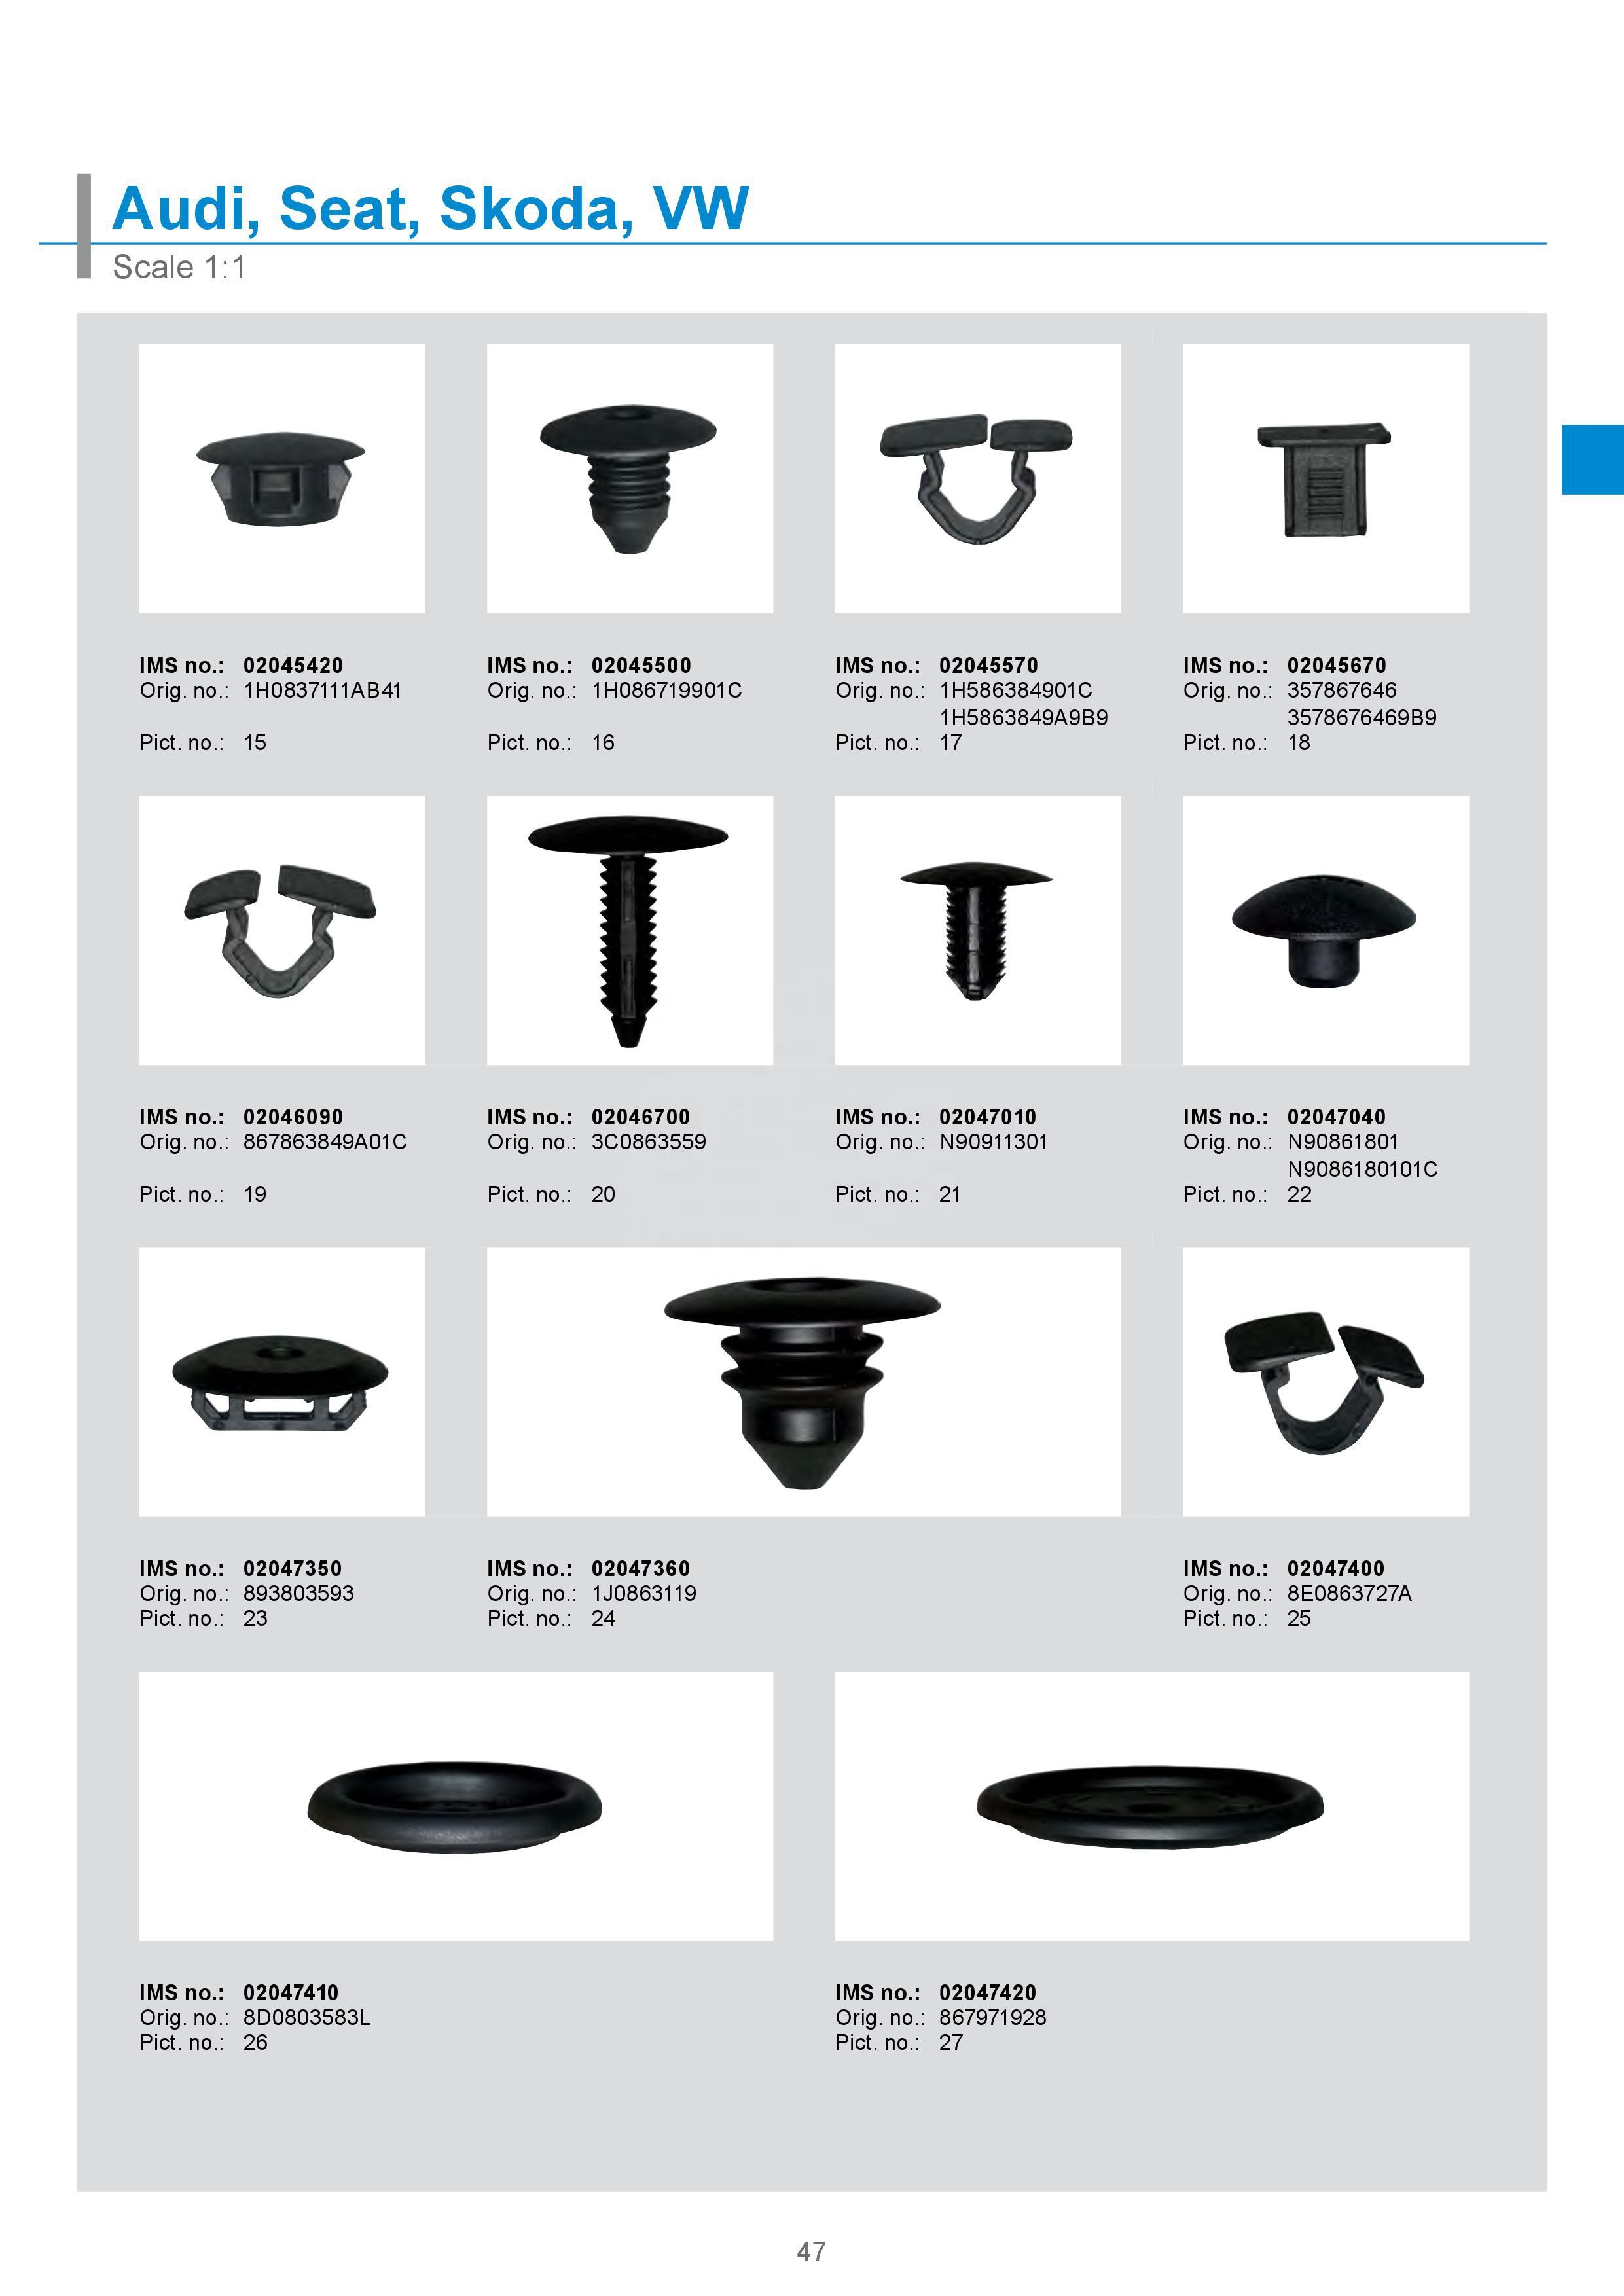 Fastener/clips/plastic screws for VW Golf/Jeeta/Passat/Polo/Scirocco/Sharan/Tiguan/Touareg/Touran/Transporter